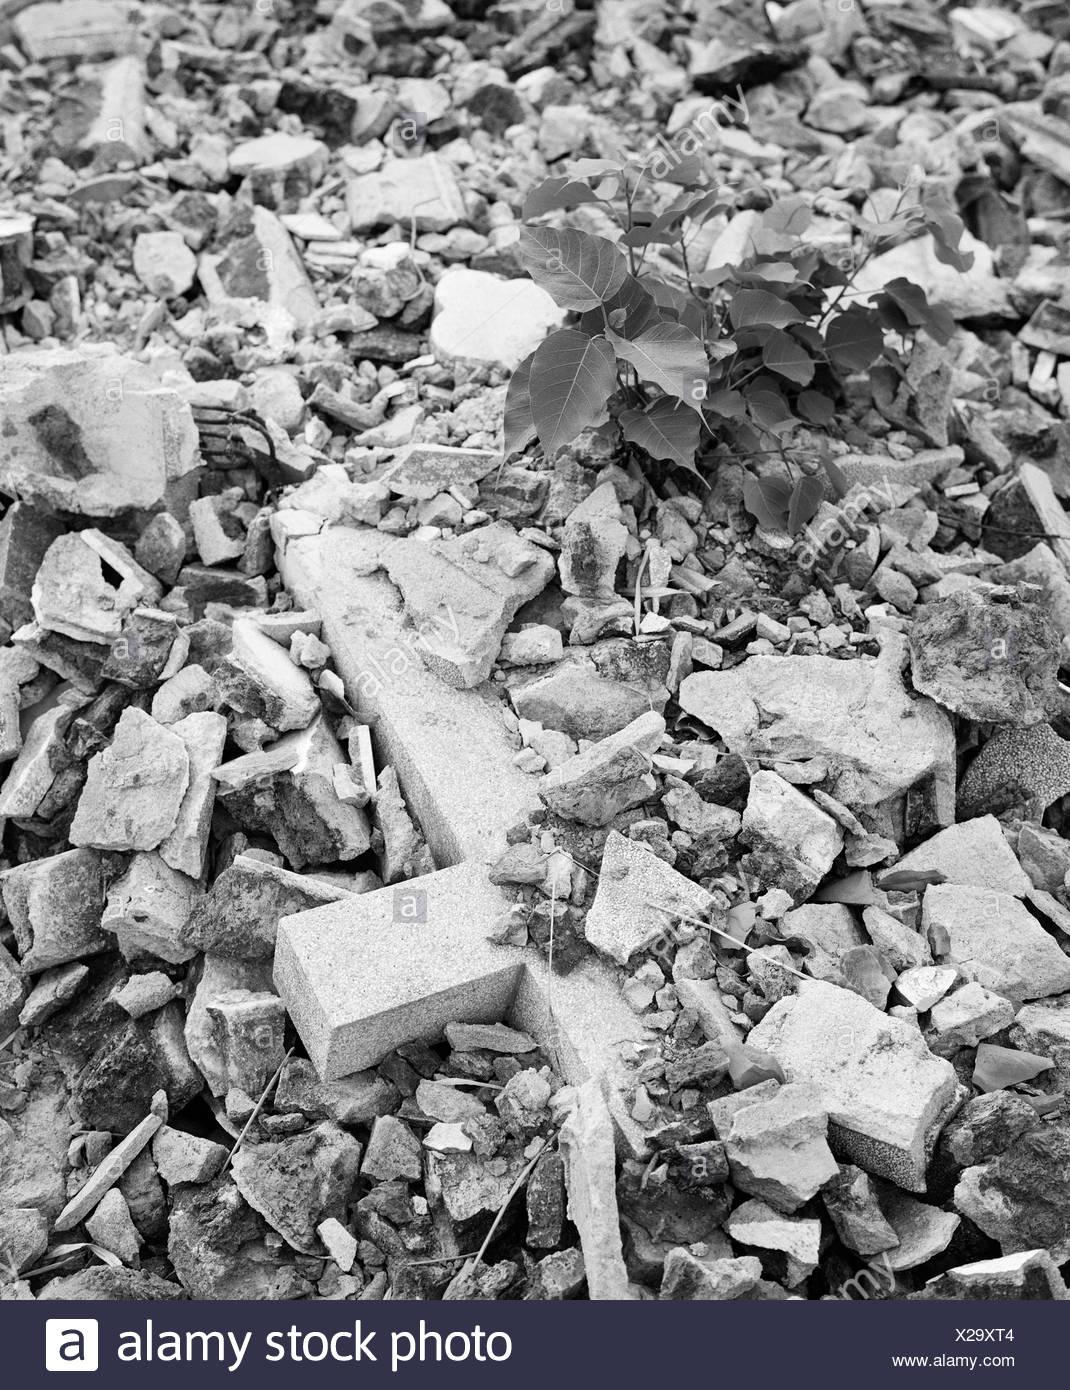 Cross amid demolished area (B&W) - Stock Image